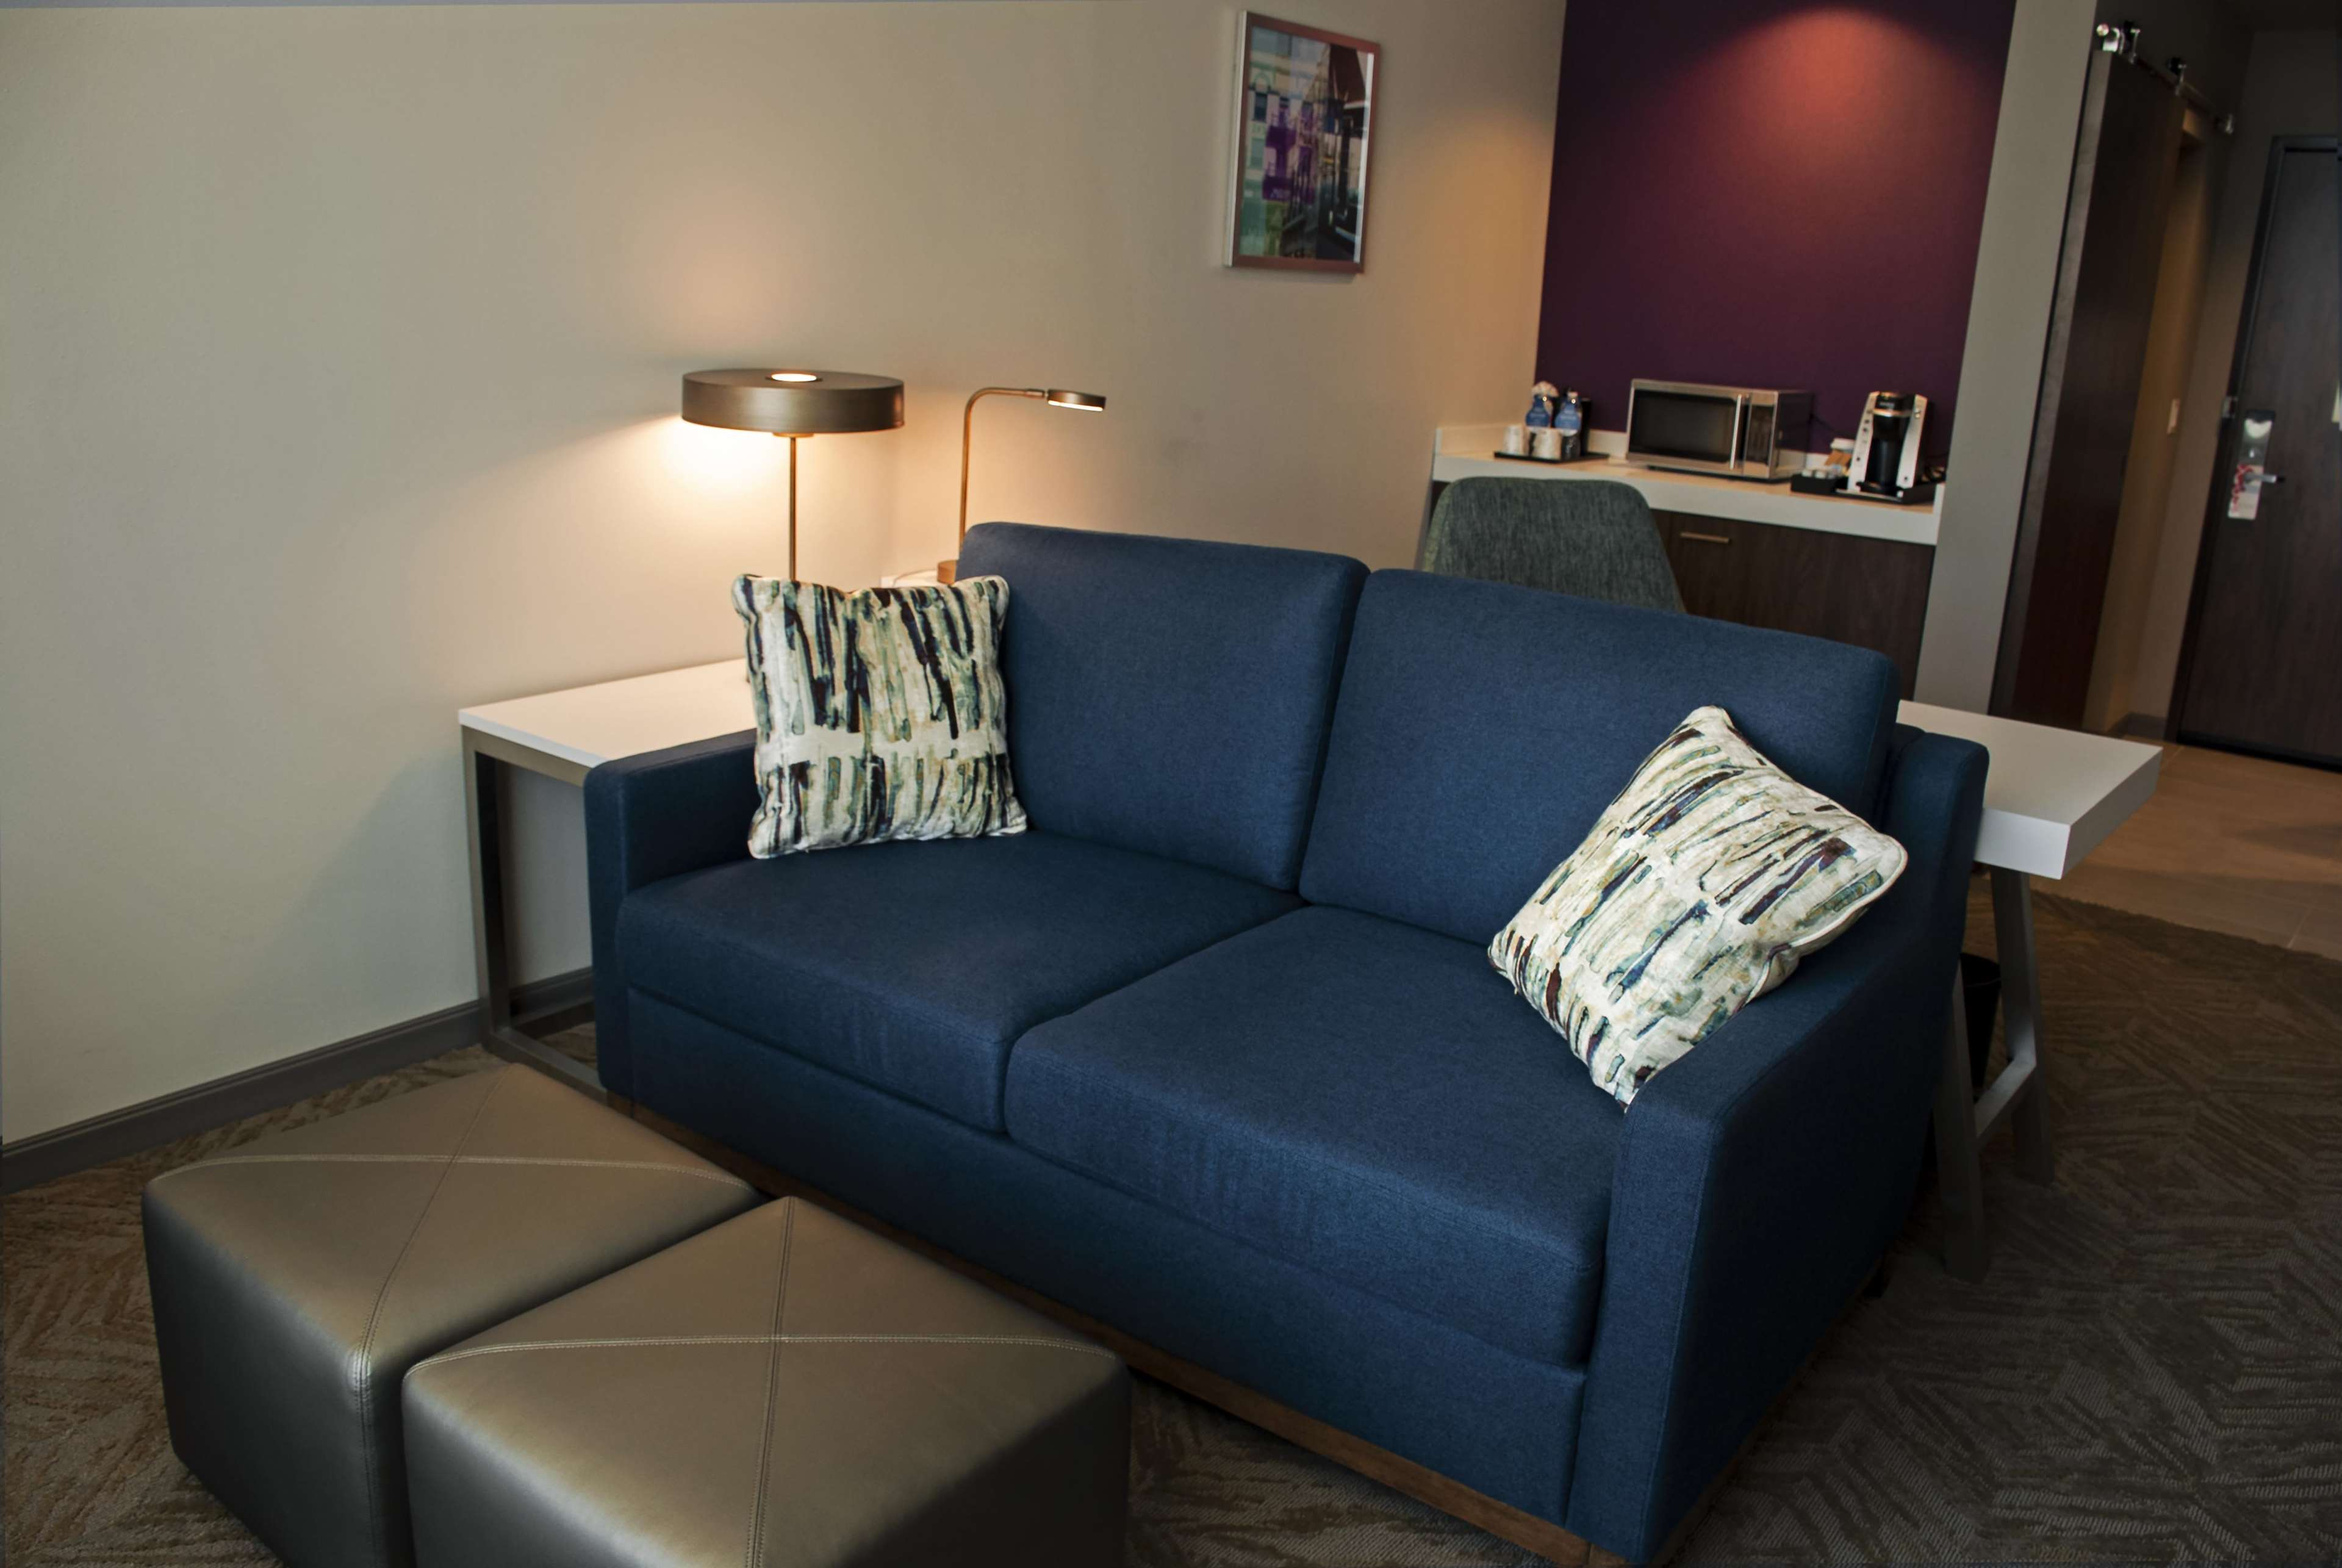 Hilton Garden Inn Dallas at Hurst Conference Center image 45